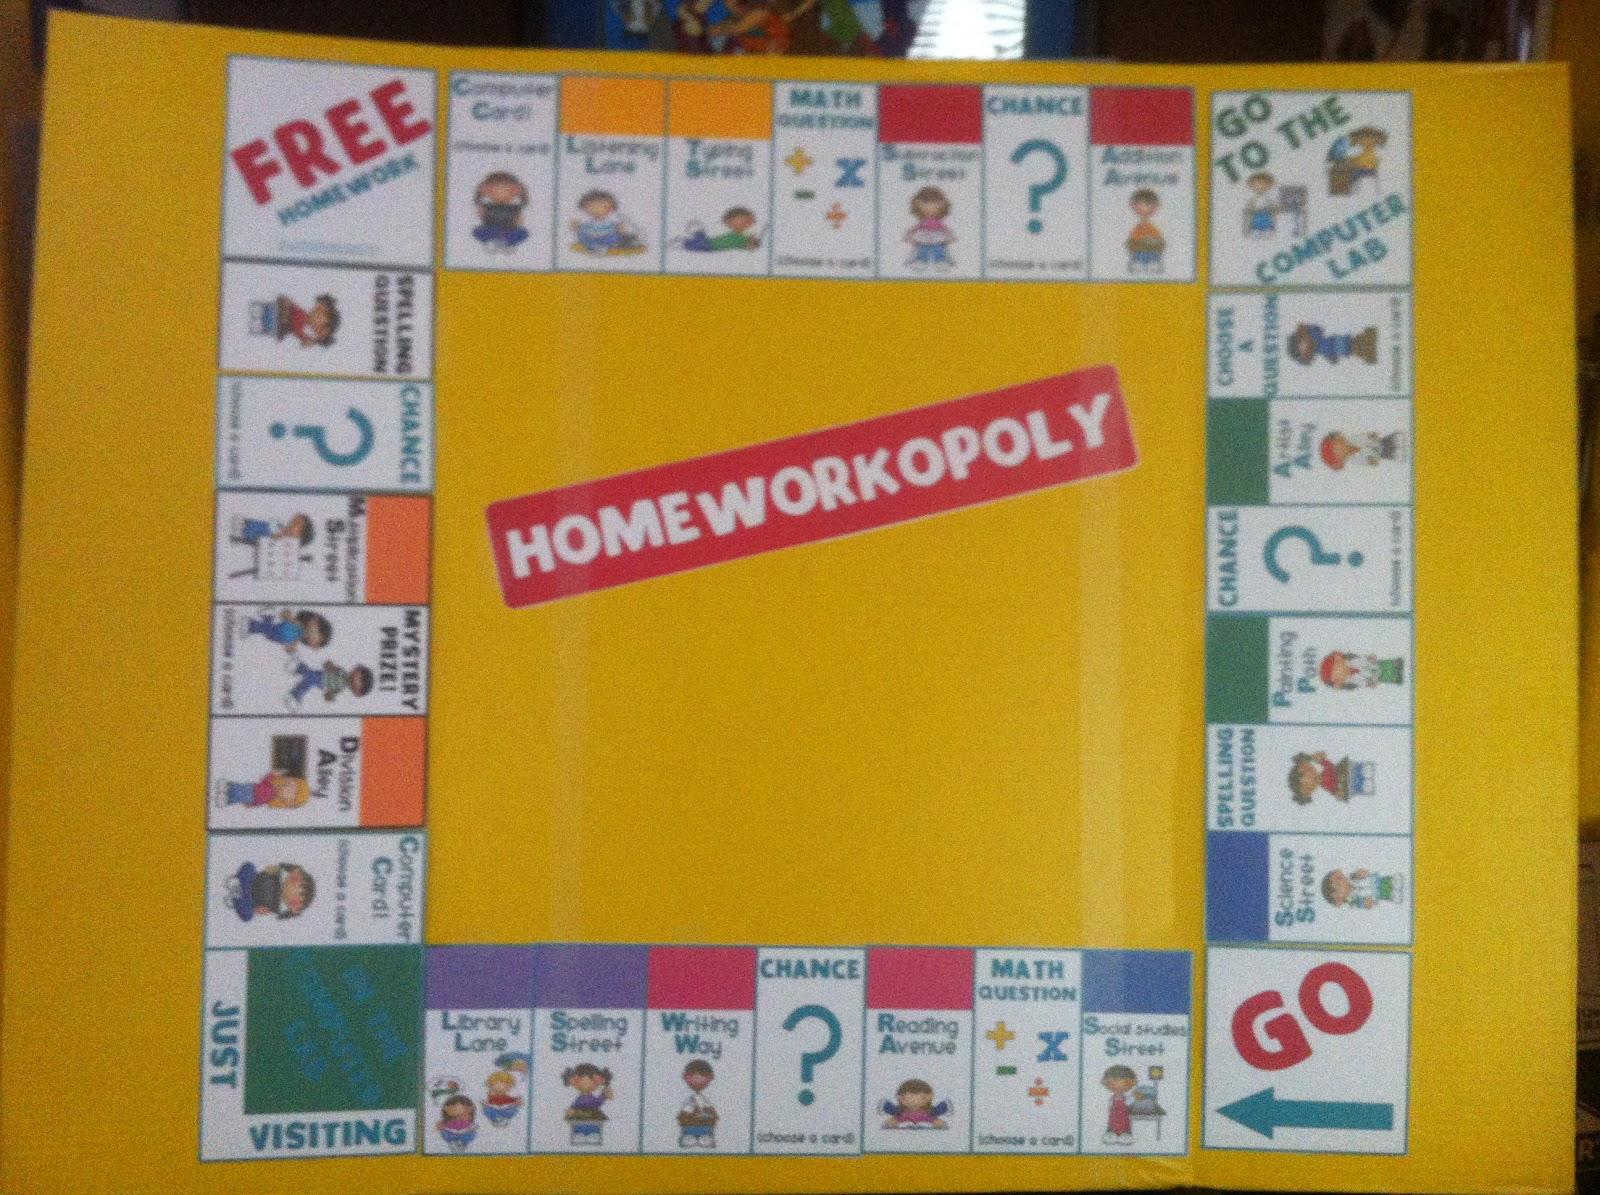 love my classroom homeworkopoly game